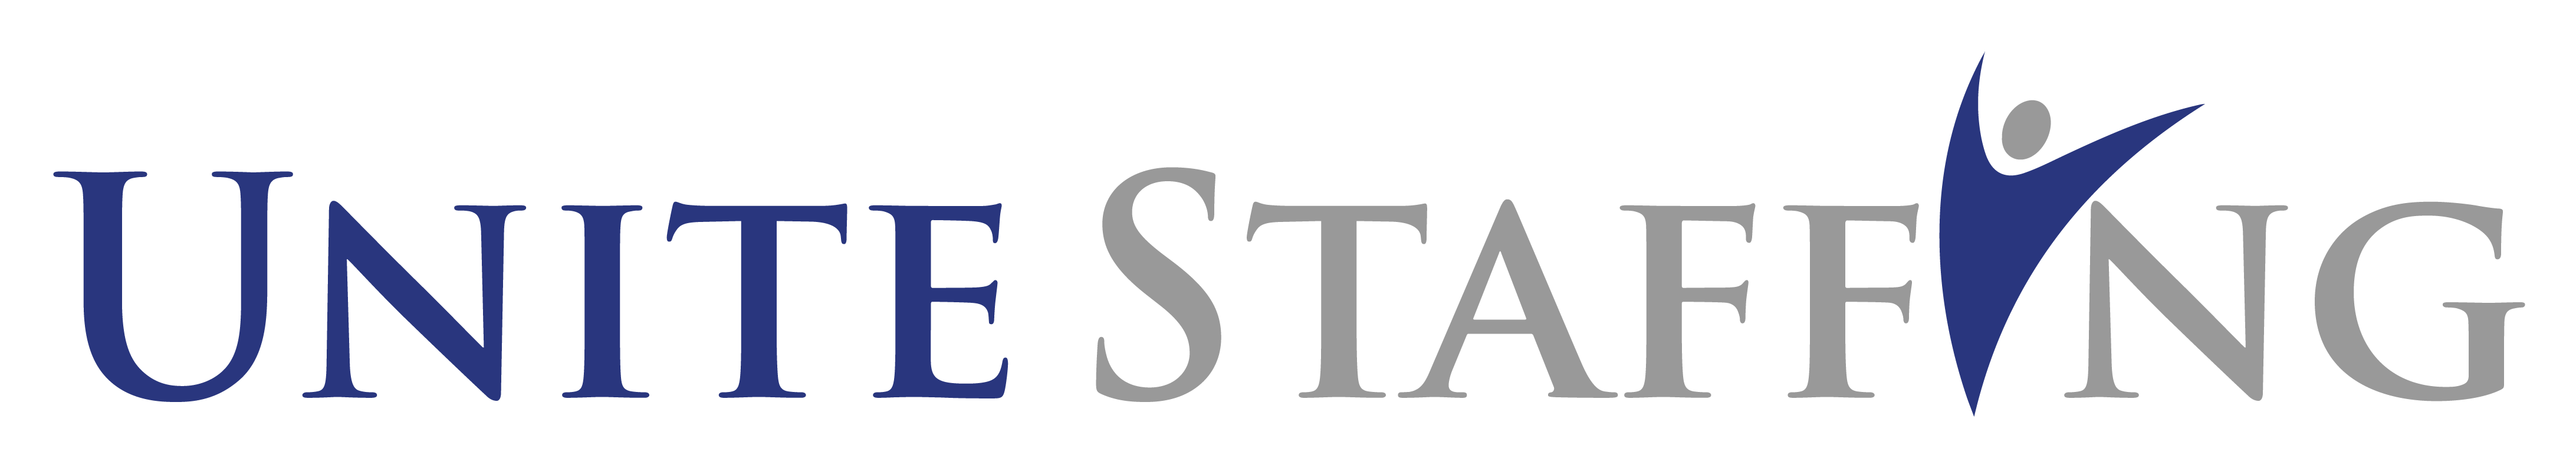 Unite Staffing